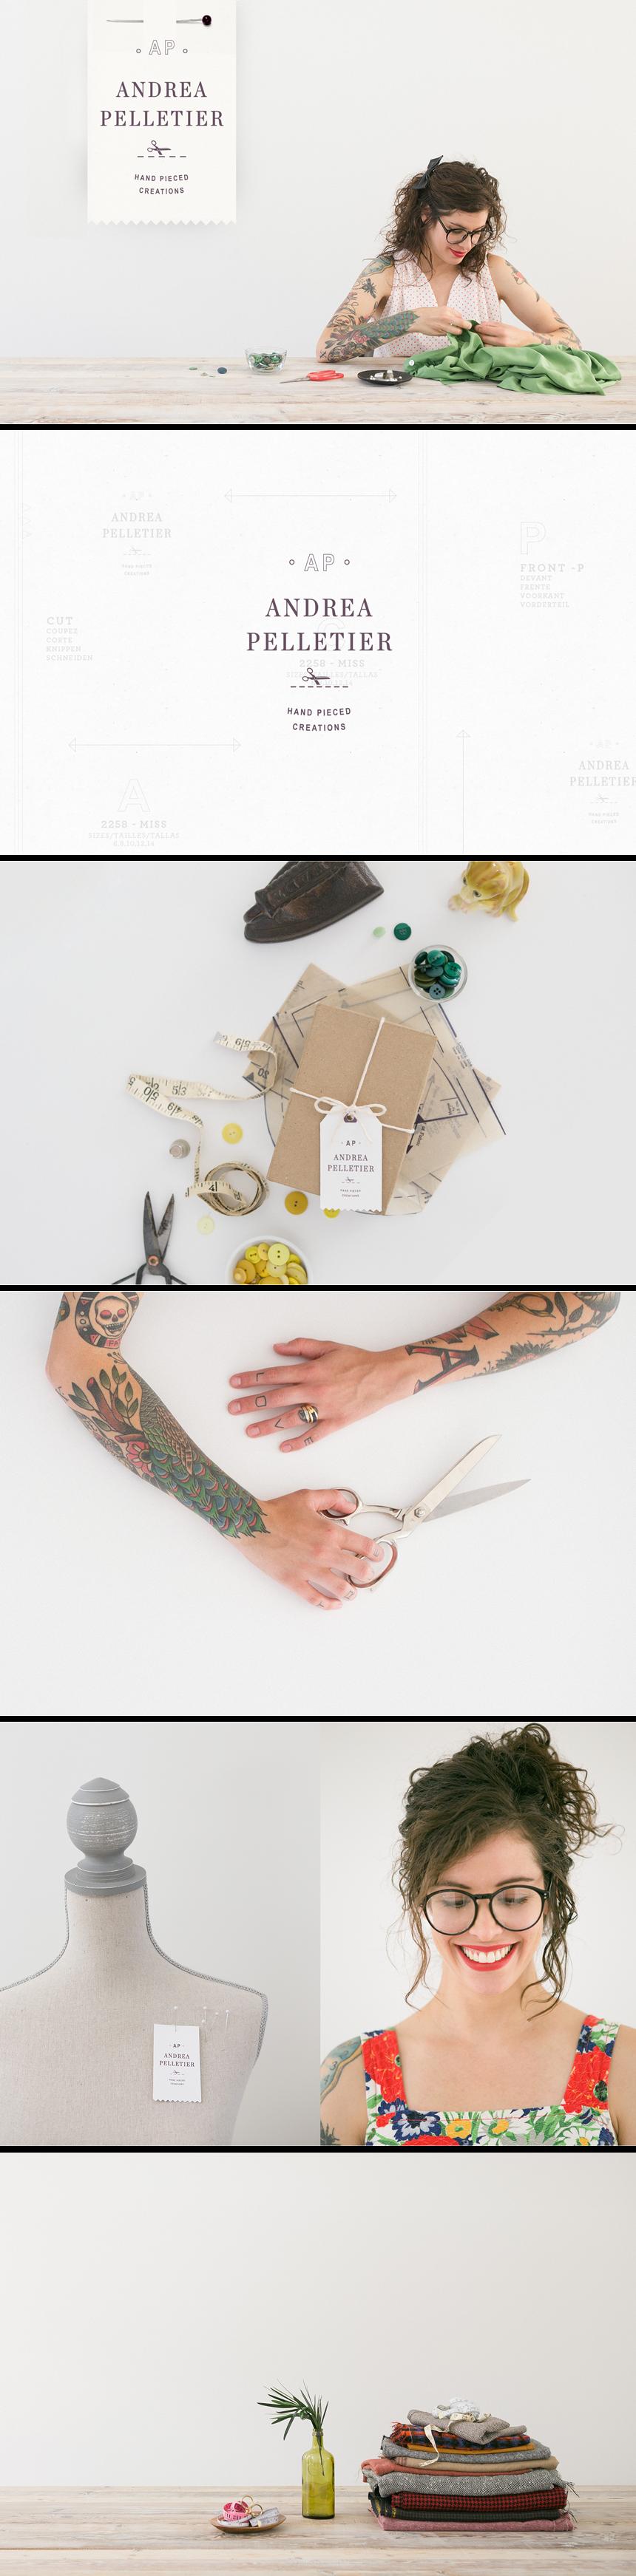 Andrea Pelletier - One Plus One Design